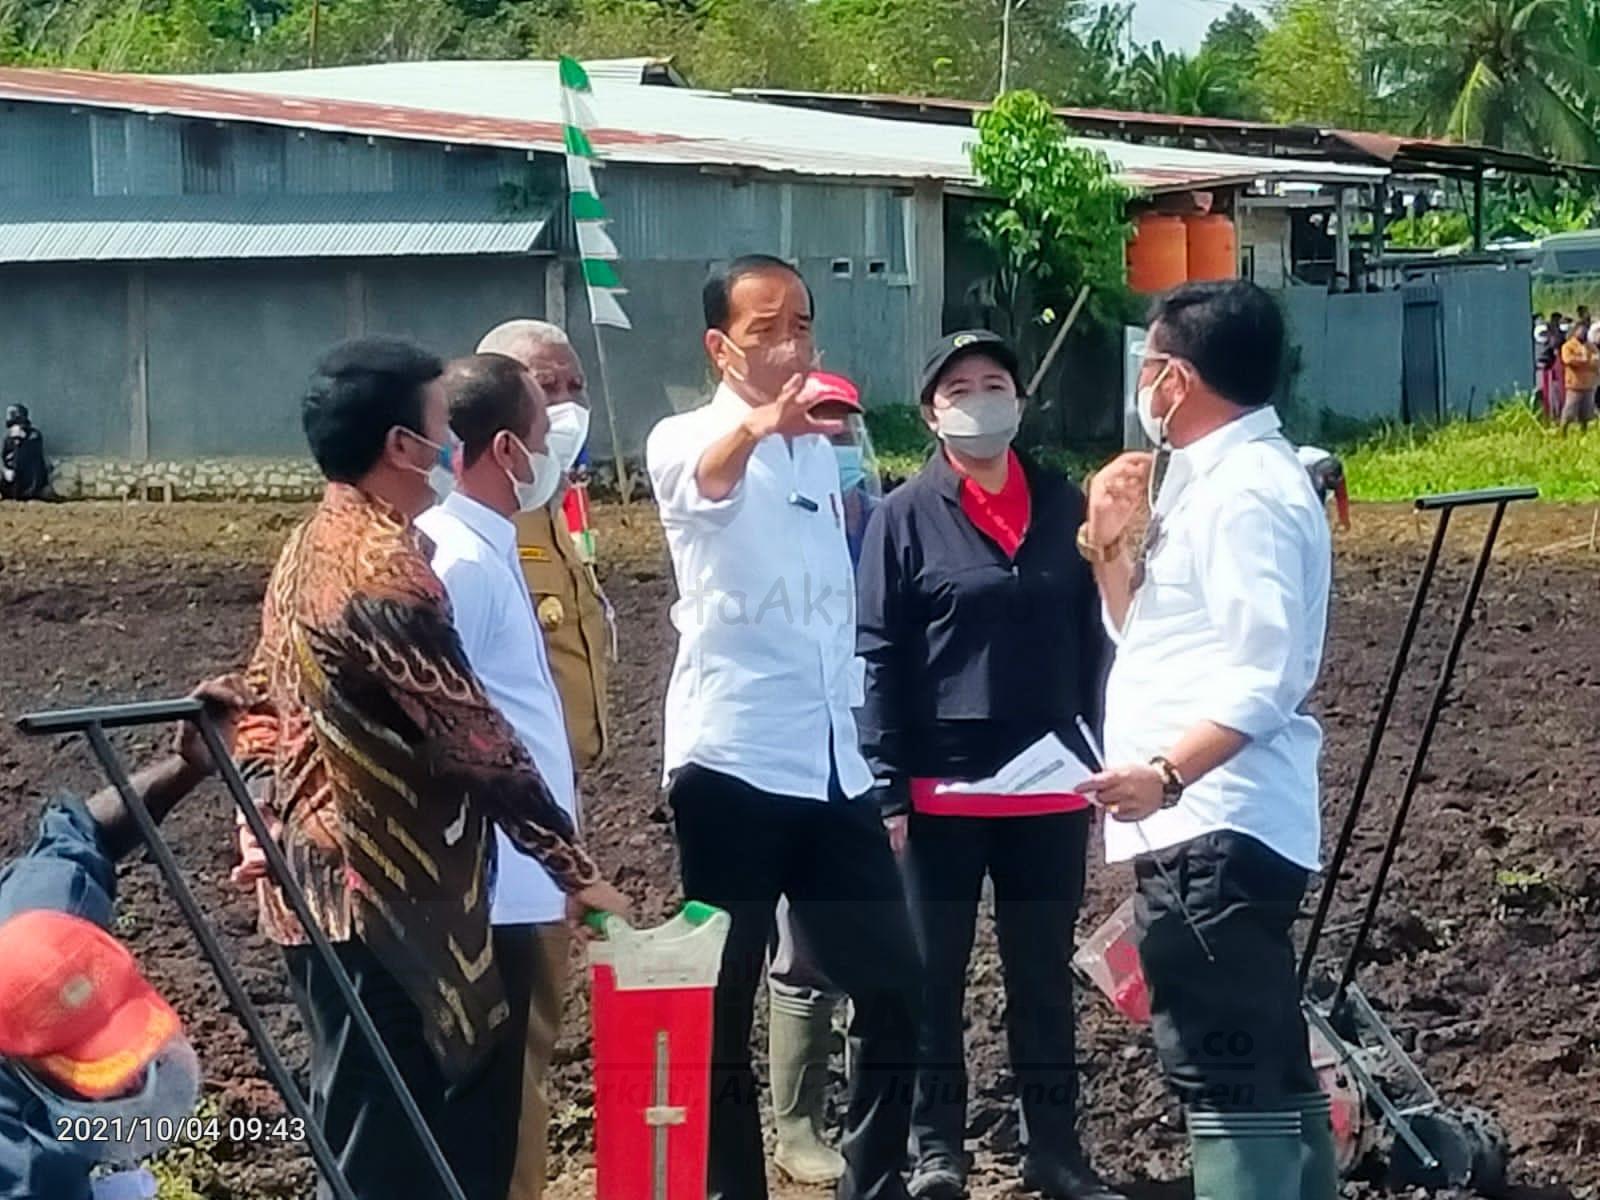 Jokowi Ingin Papua Barat Jadi Produsen Pertanian Indonesia Timur 4 IMG 20211004 WA0006